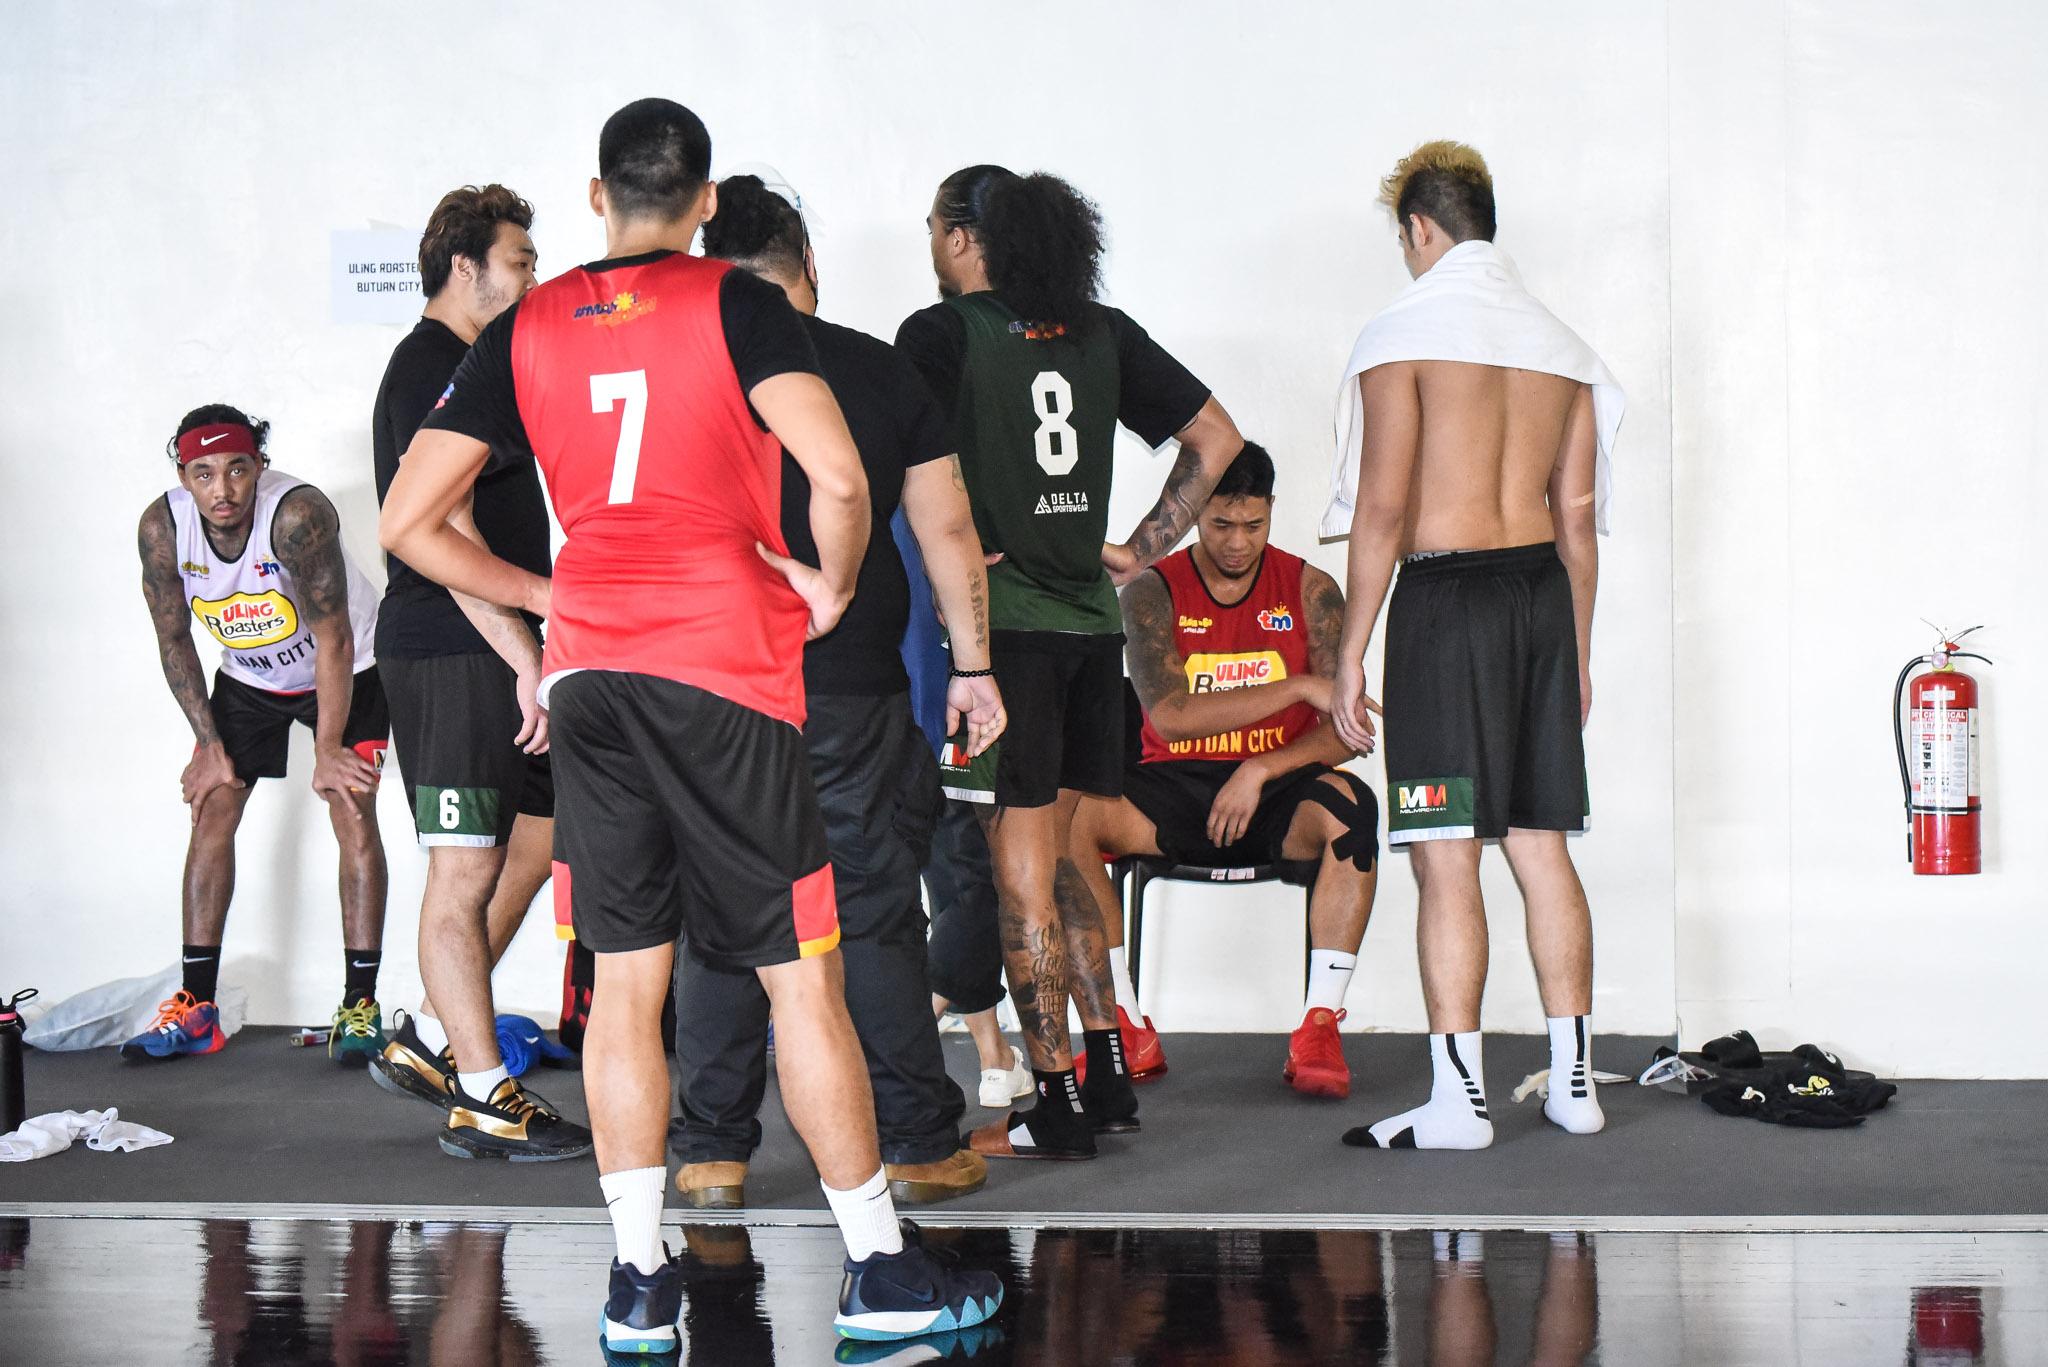 Chooks-to-Go-Pilipinas-3X3-Scuffle-4 In-game trash talk led to Nueva Ecija-Butuan backstage scuffle 3x3 Basketball Chooks-to-Go Pilipinas 3x3 News  - philippine sports news